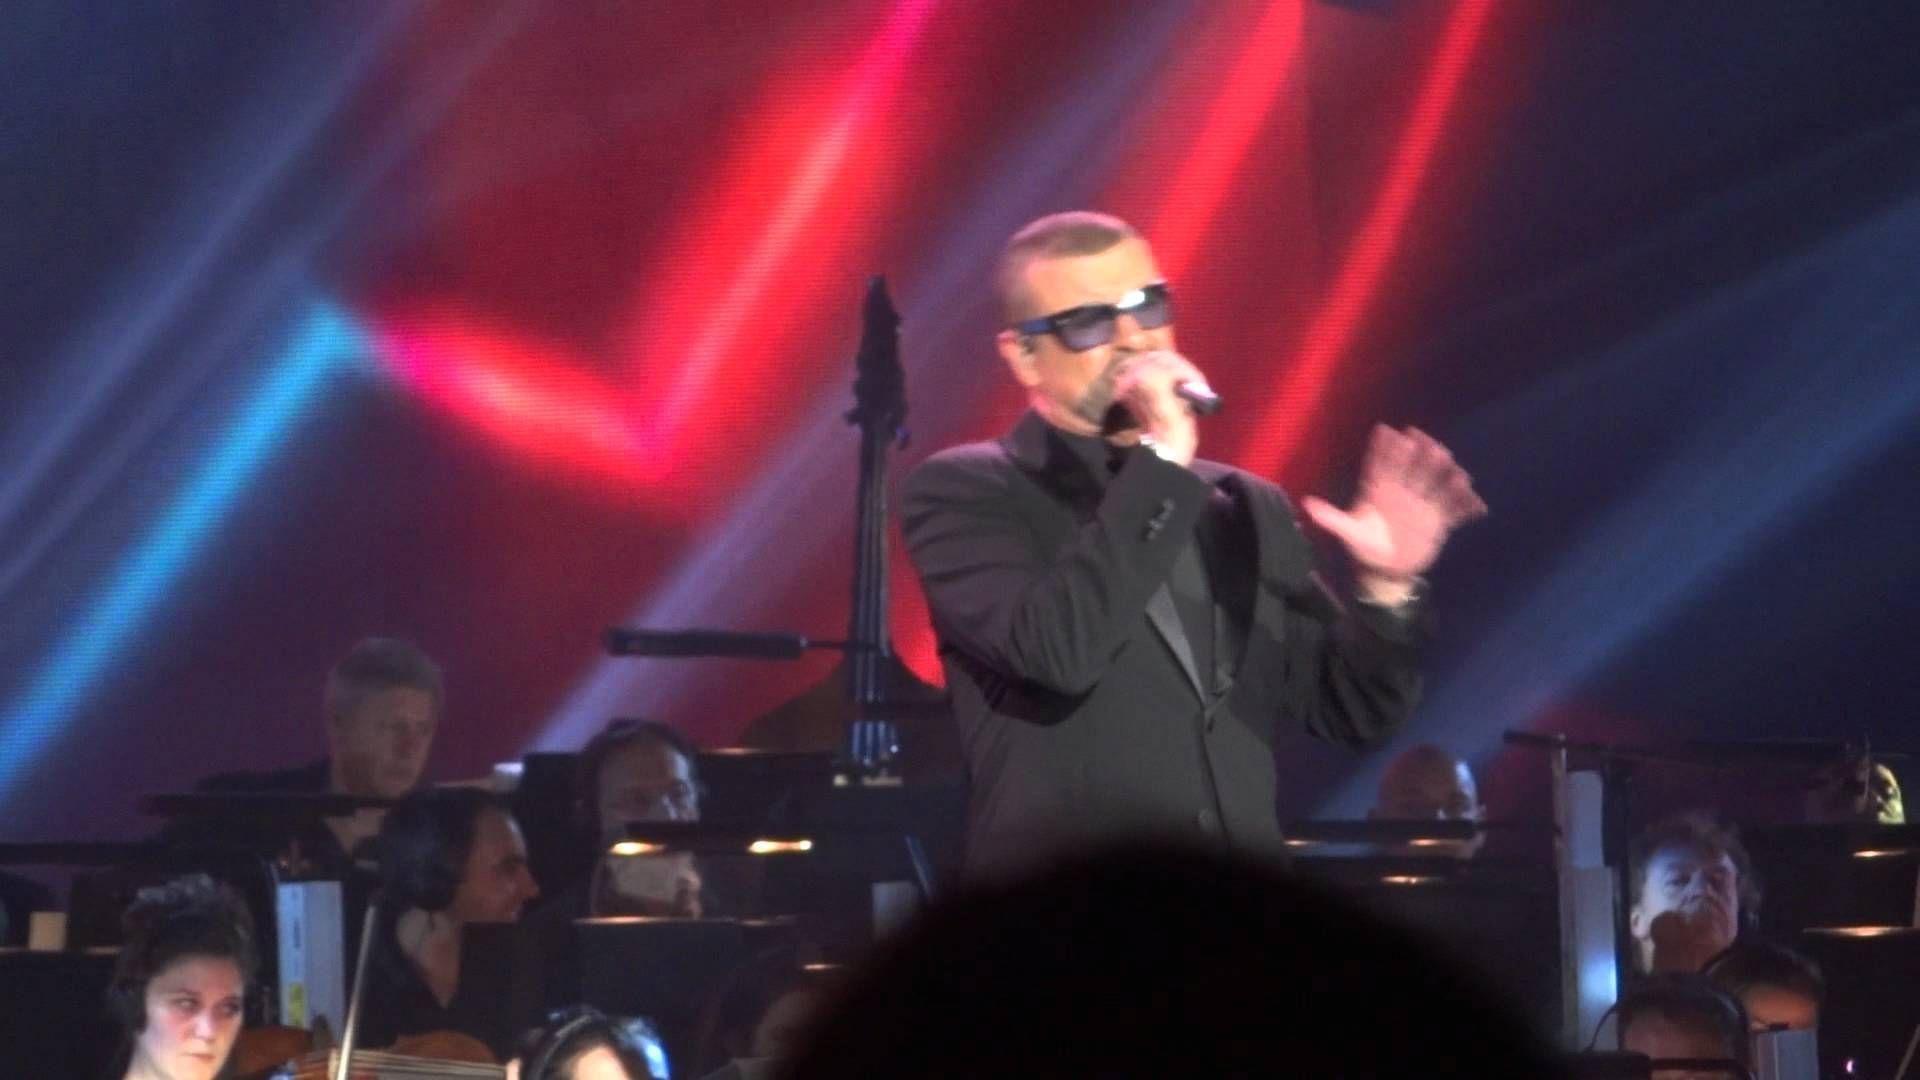 George Michael Symphonica Orchestral Concert Tour - Echo Arena - 10/10/2012